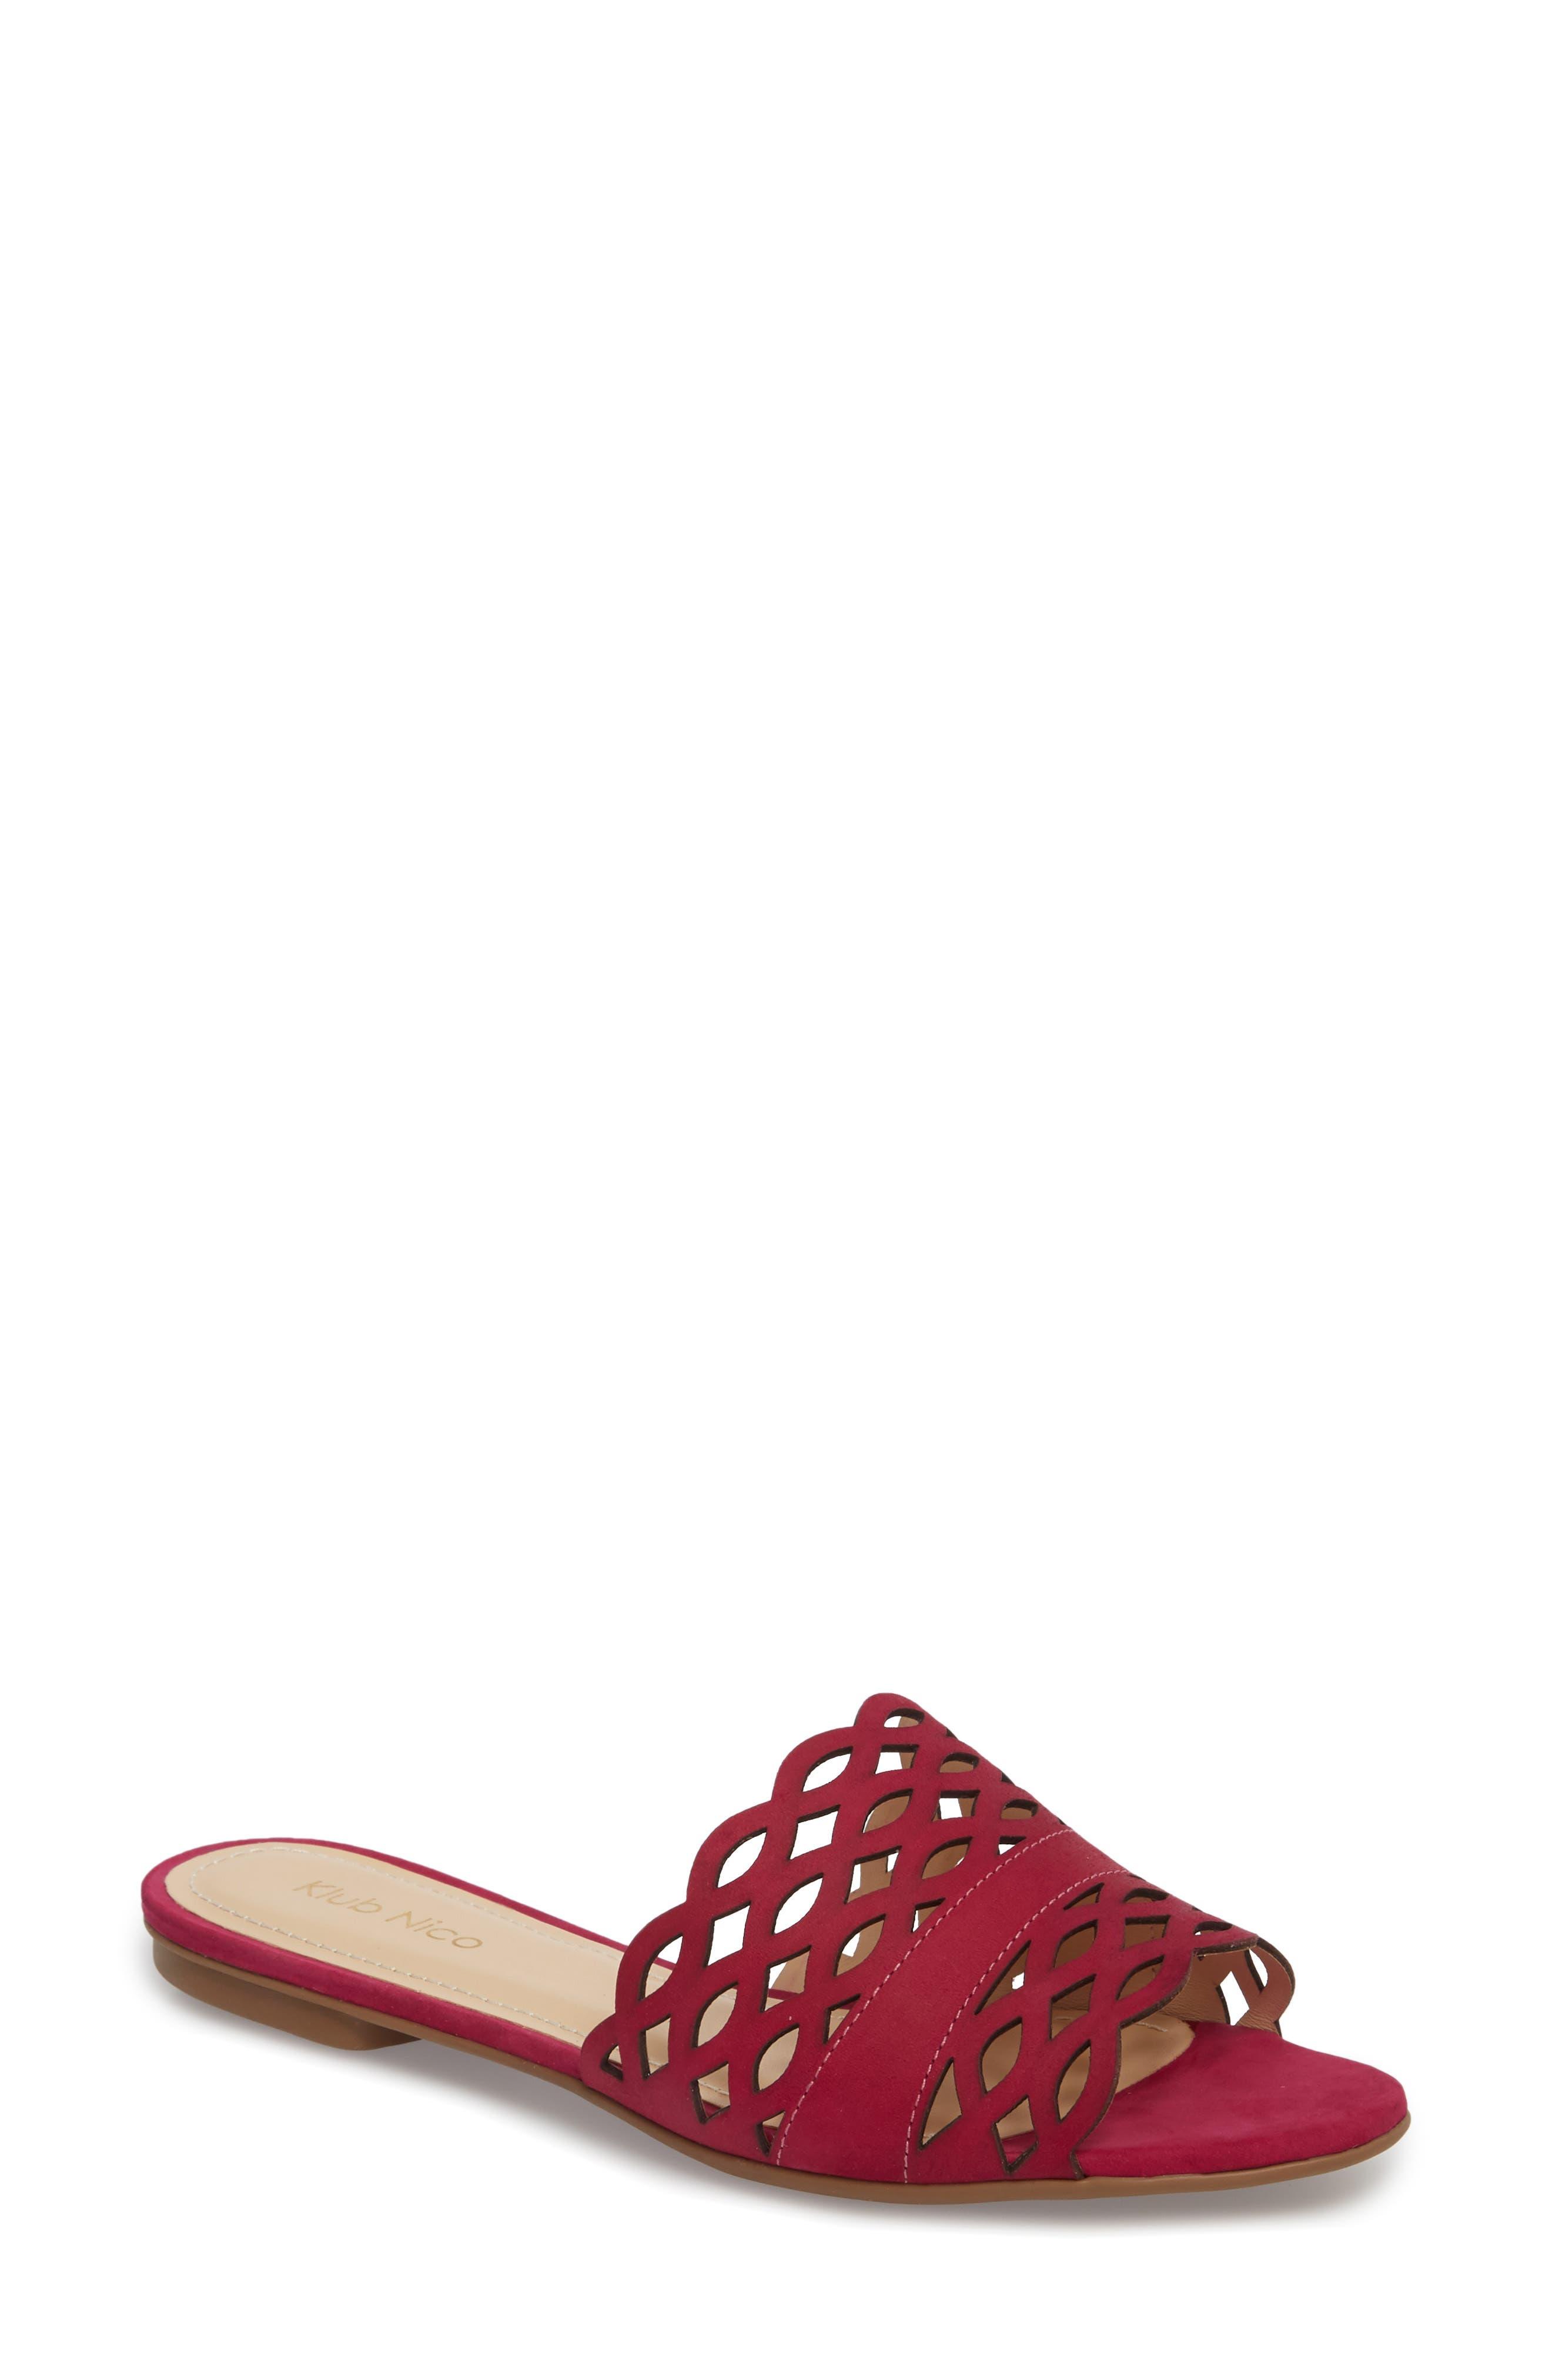 Klub Nico Gynne Slide Sandal, Pink